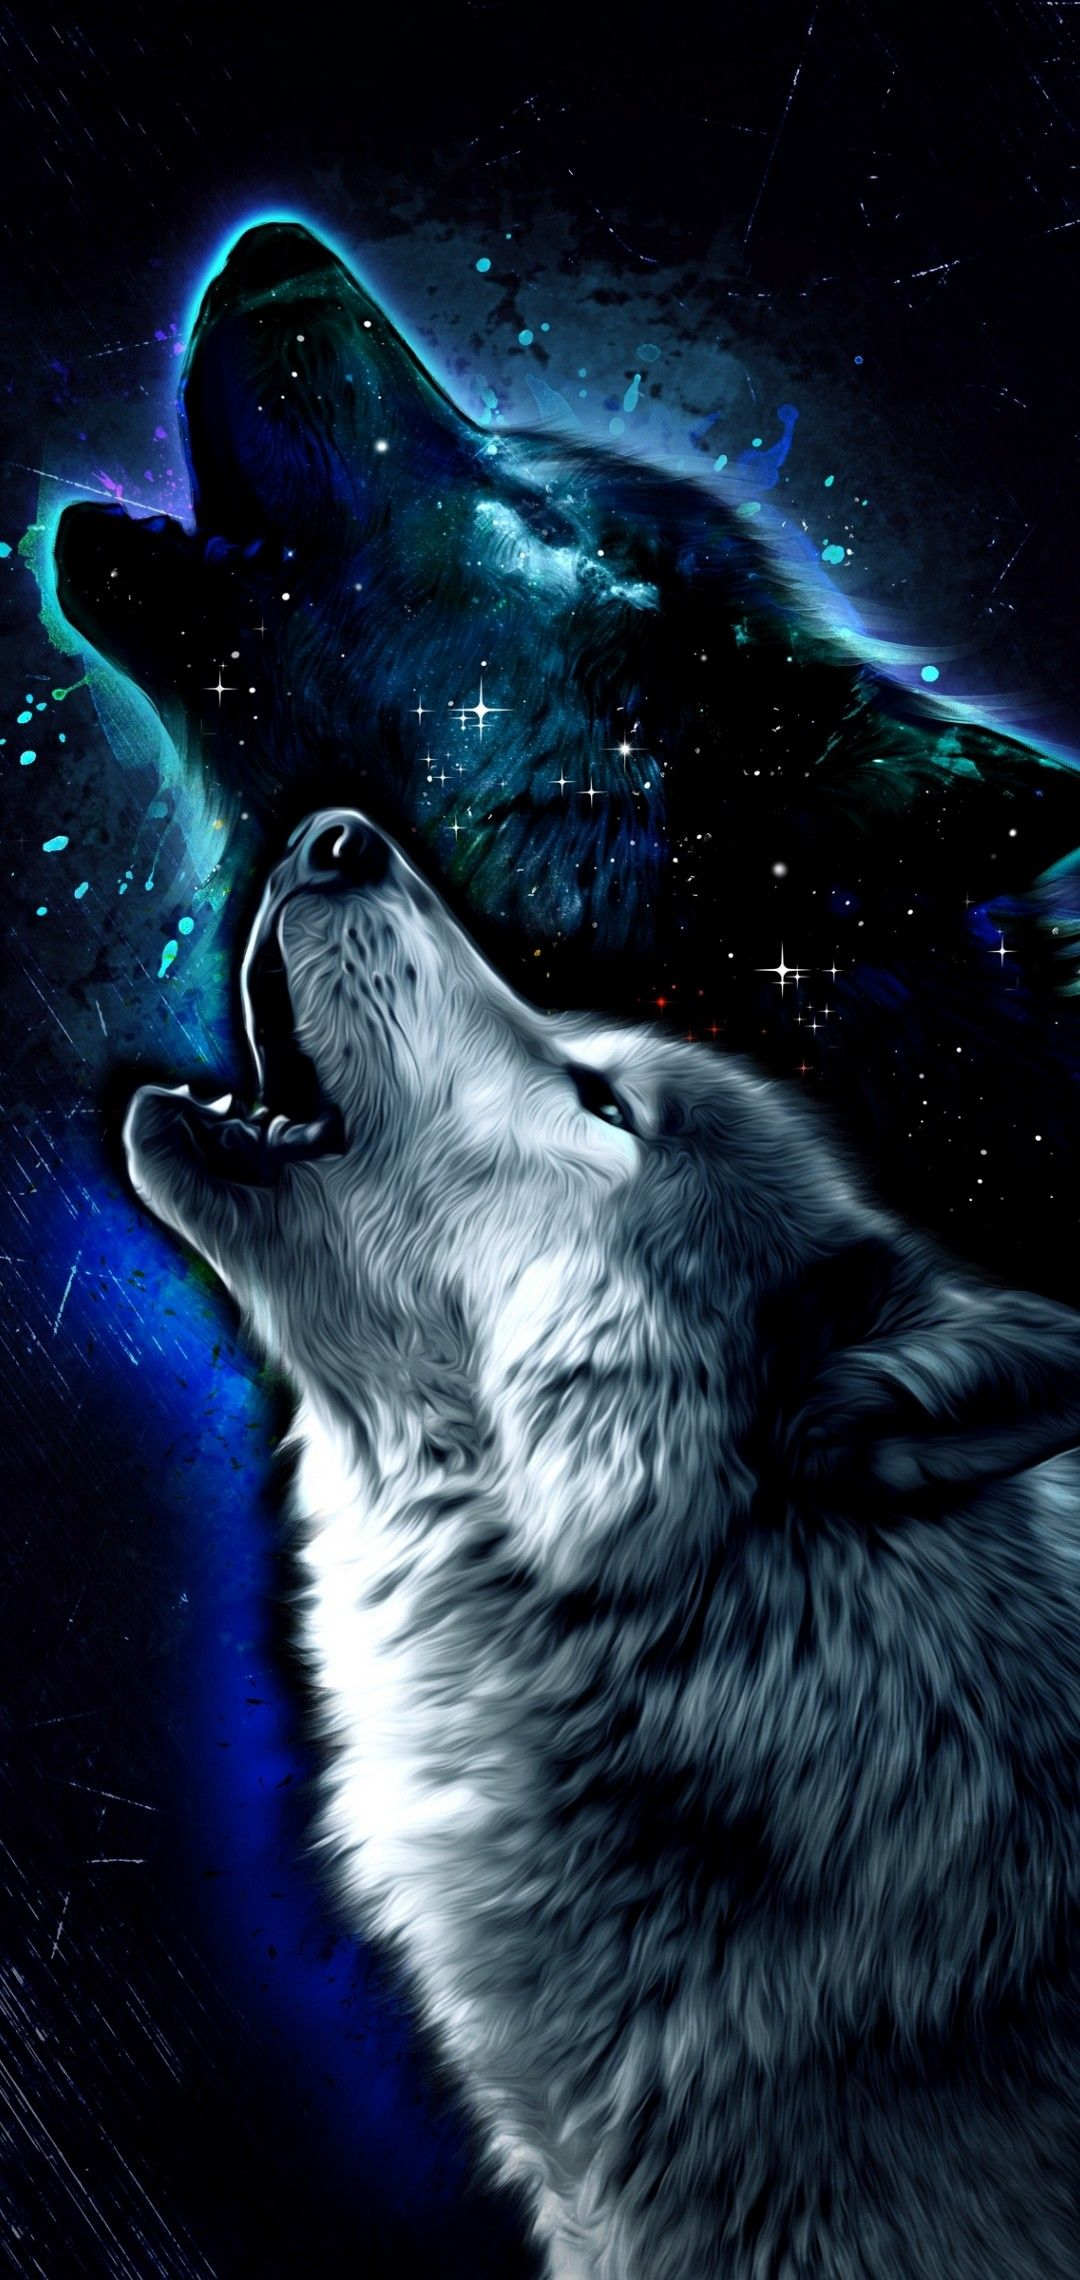 Wolf Animalwallpaper Wallpaper Creativewallpaper Creative